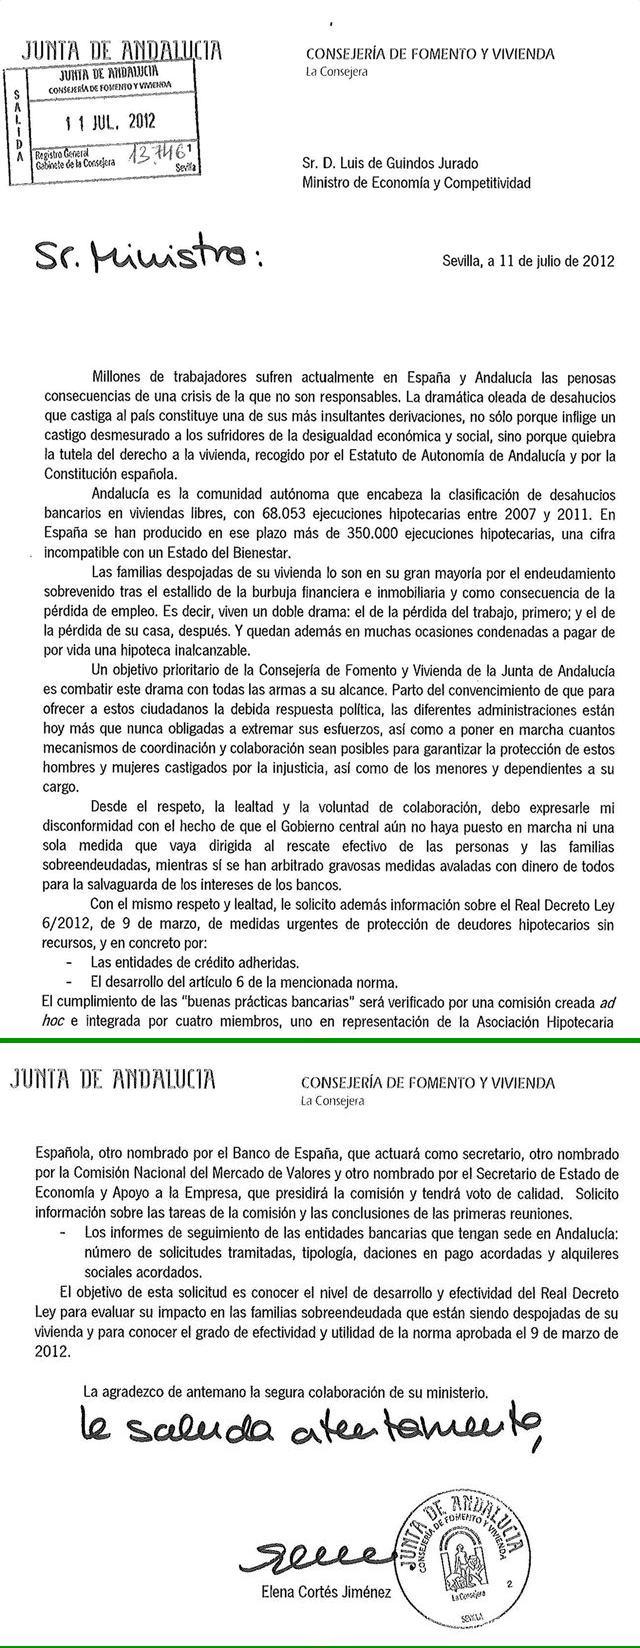 20120719113457-20120713cartaelenacortesadeguindos-pagina-1-vert.jpg